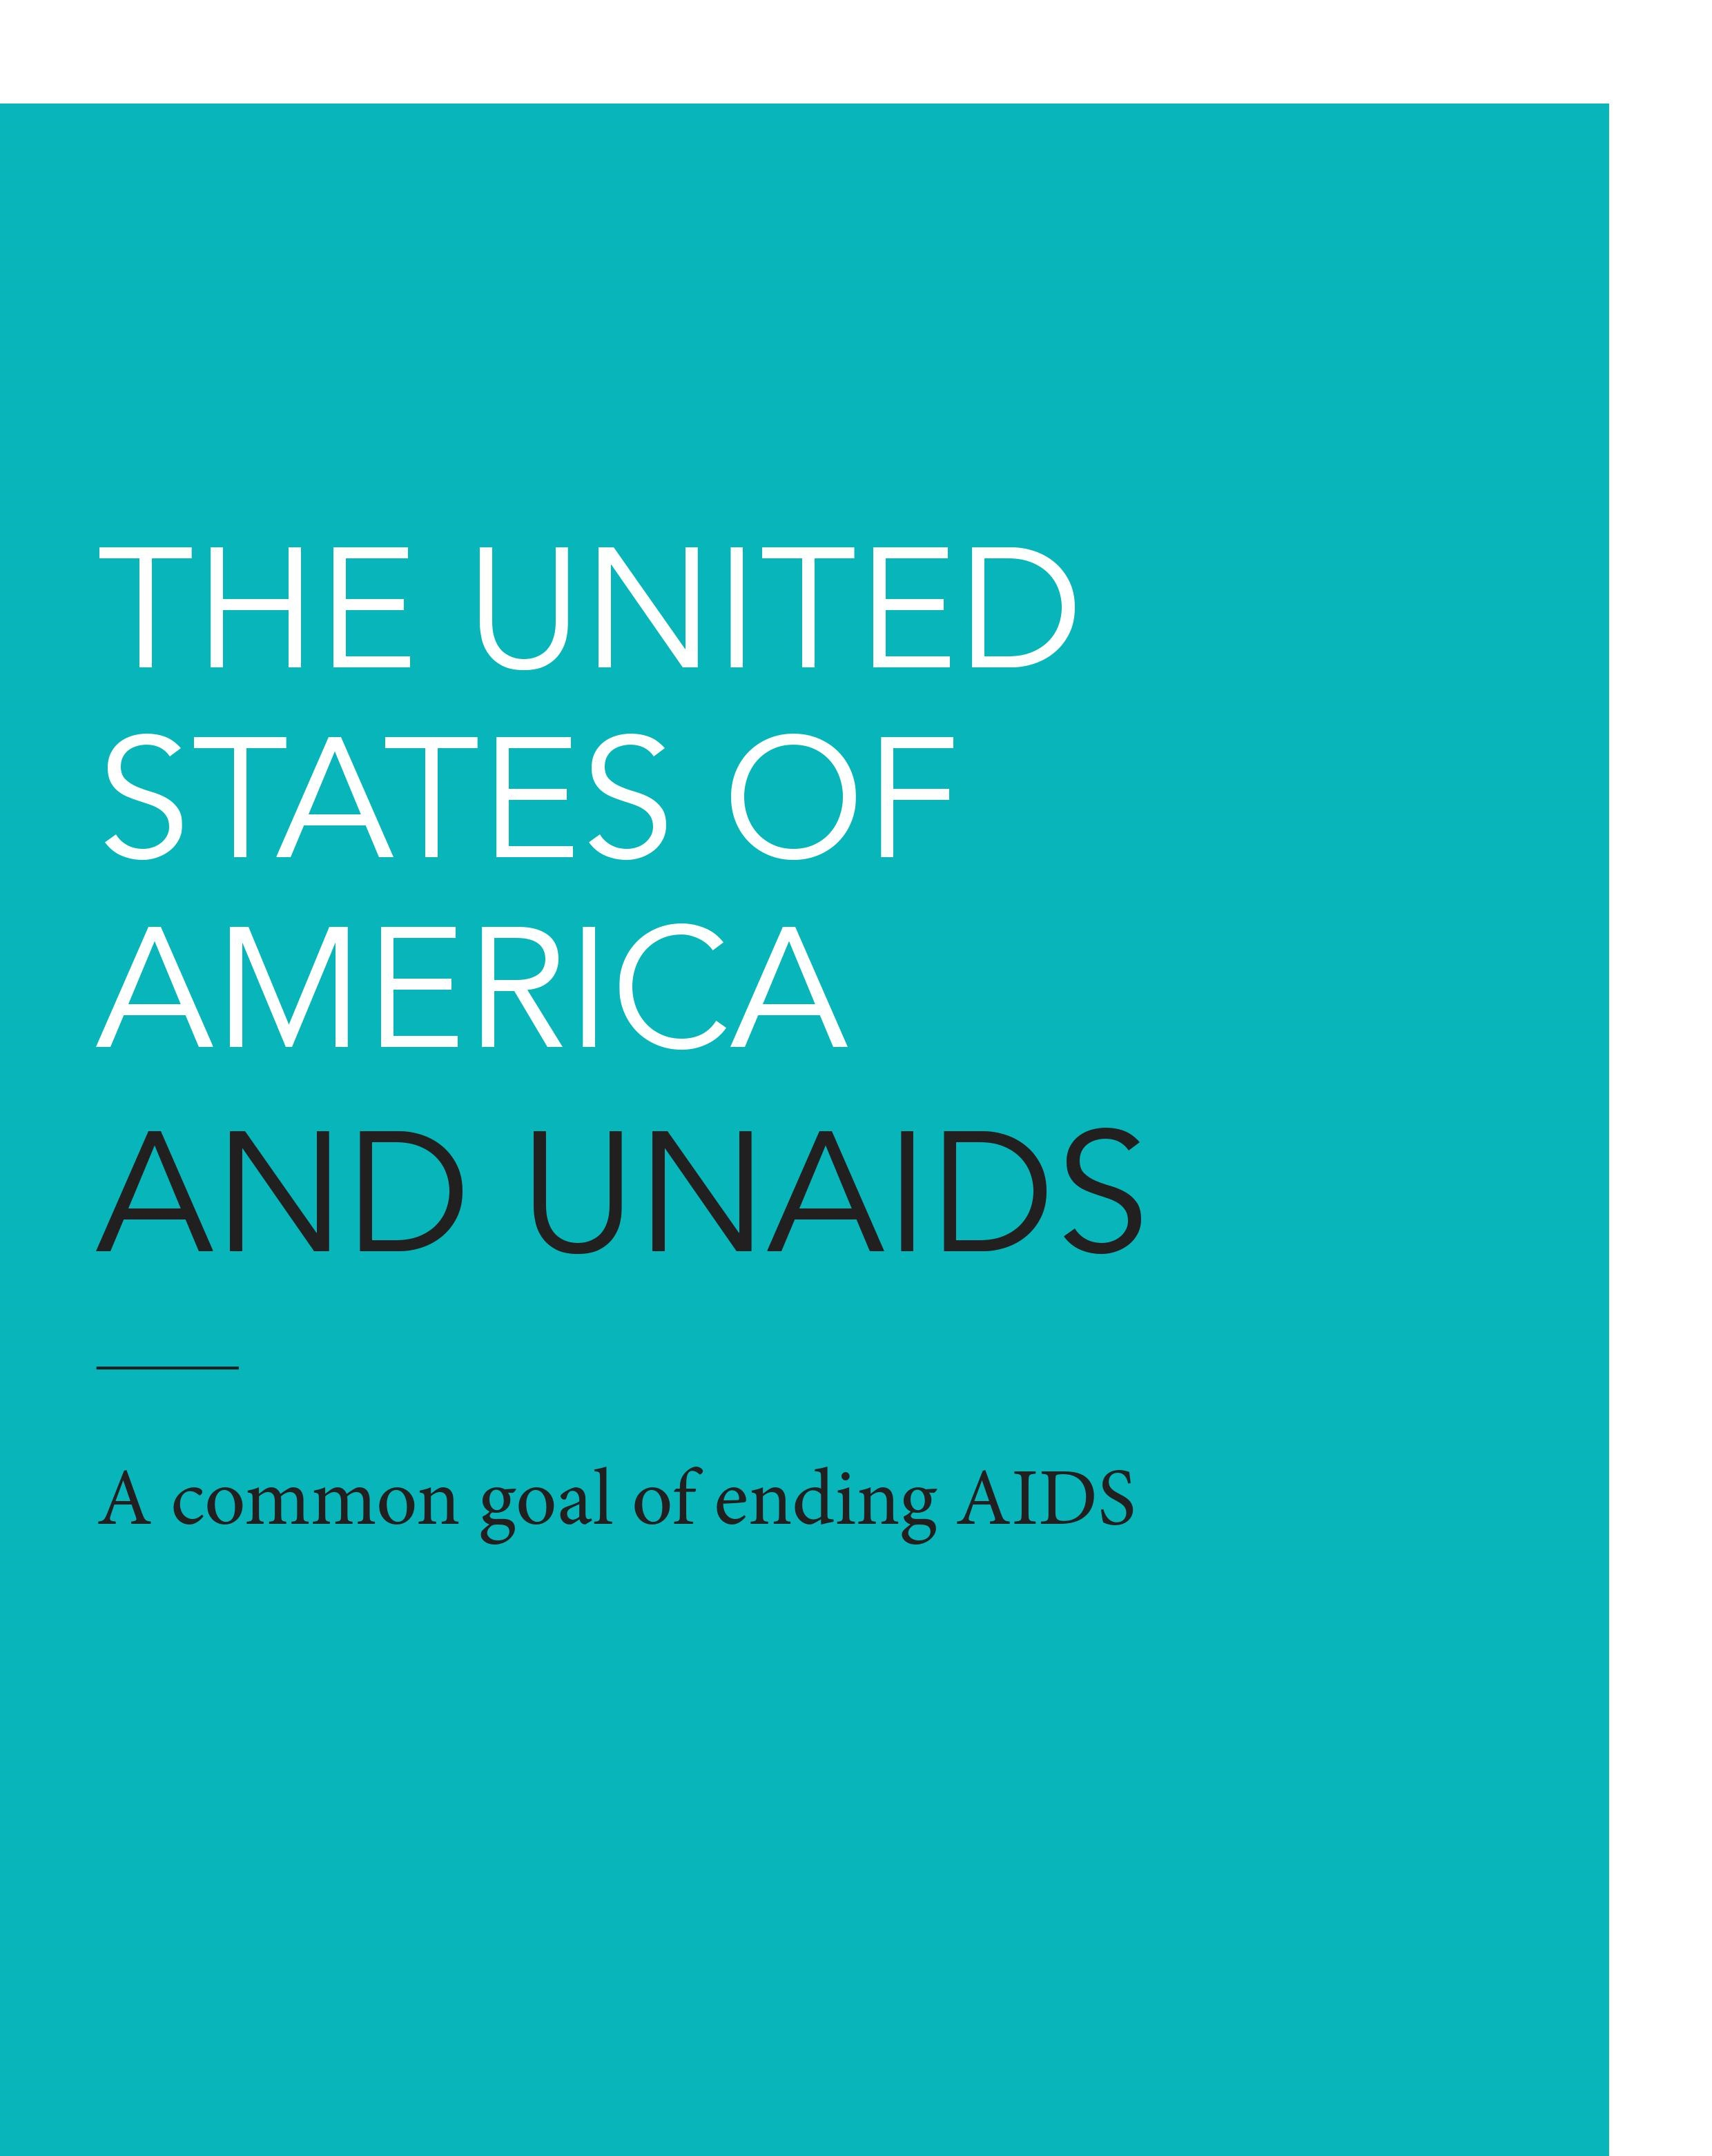 The USA and UNAIDS